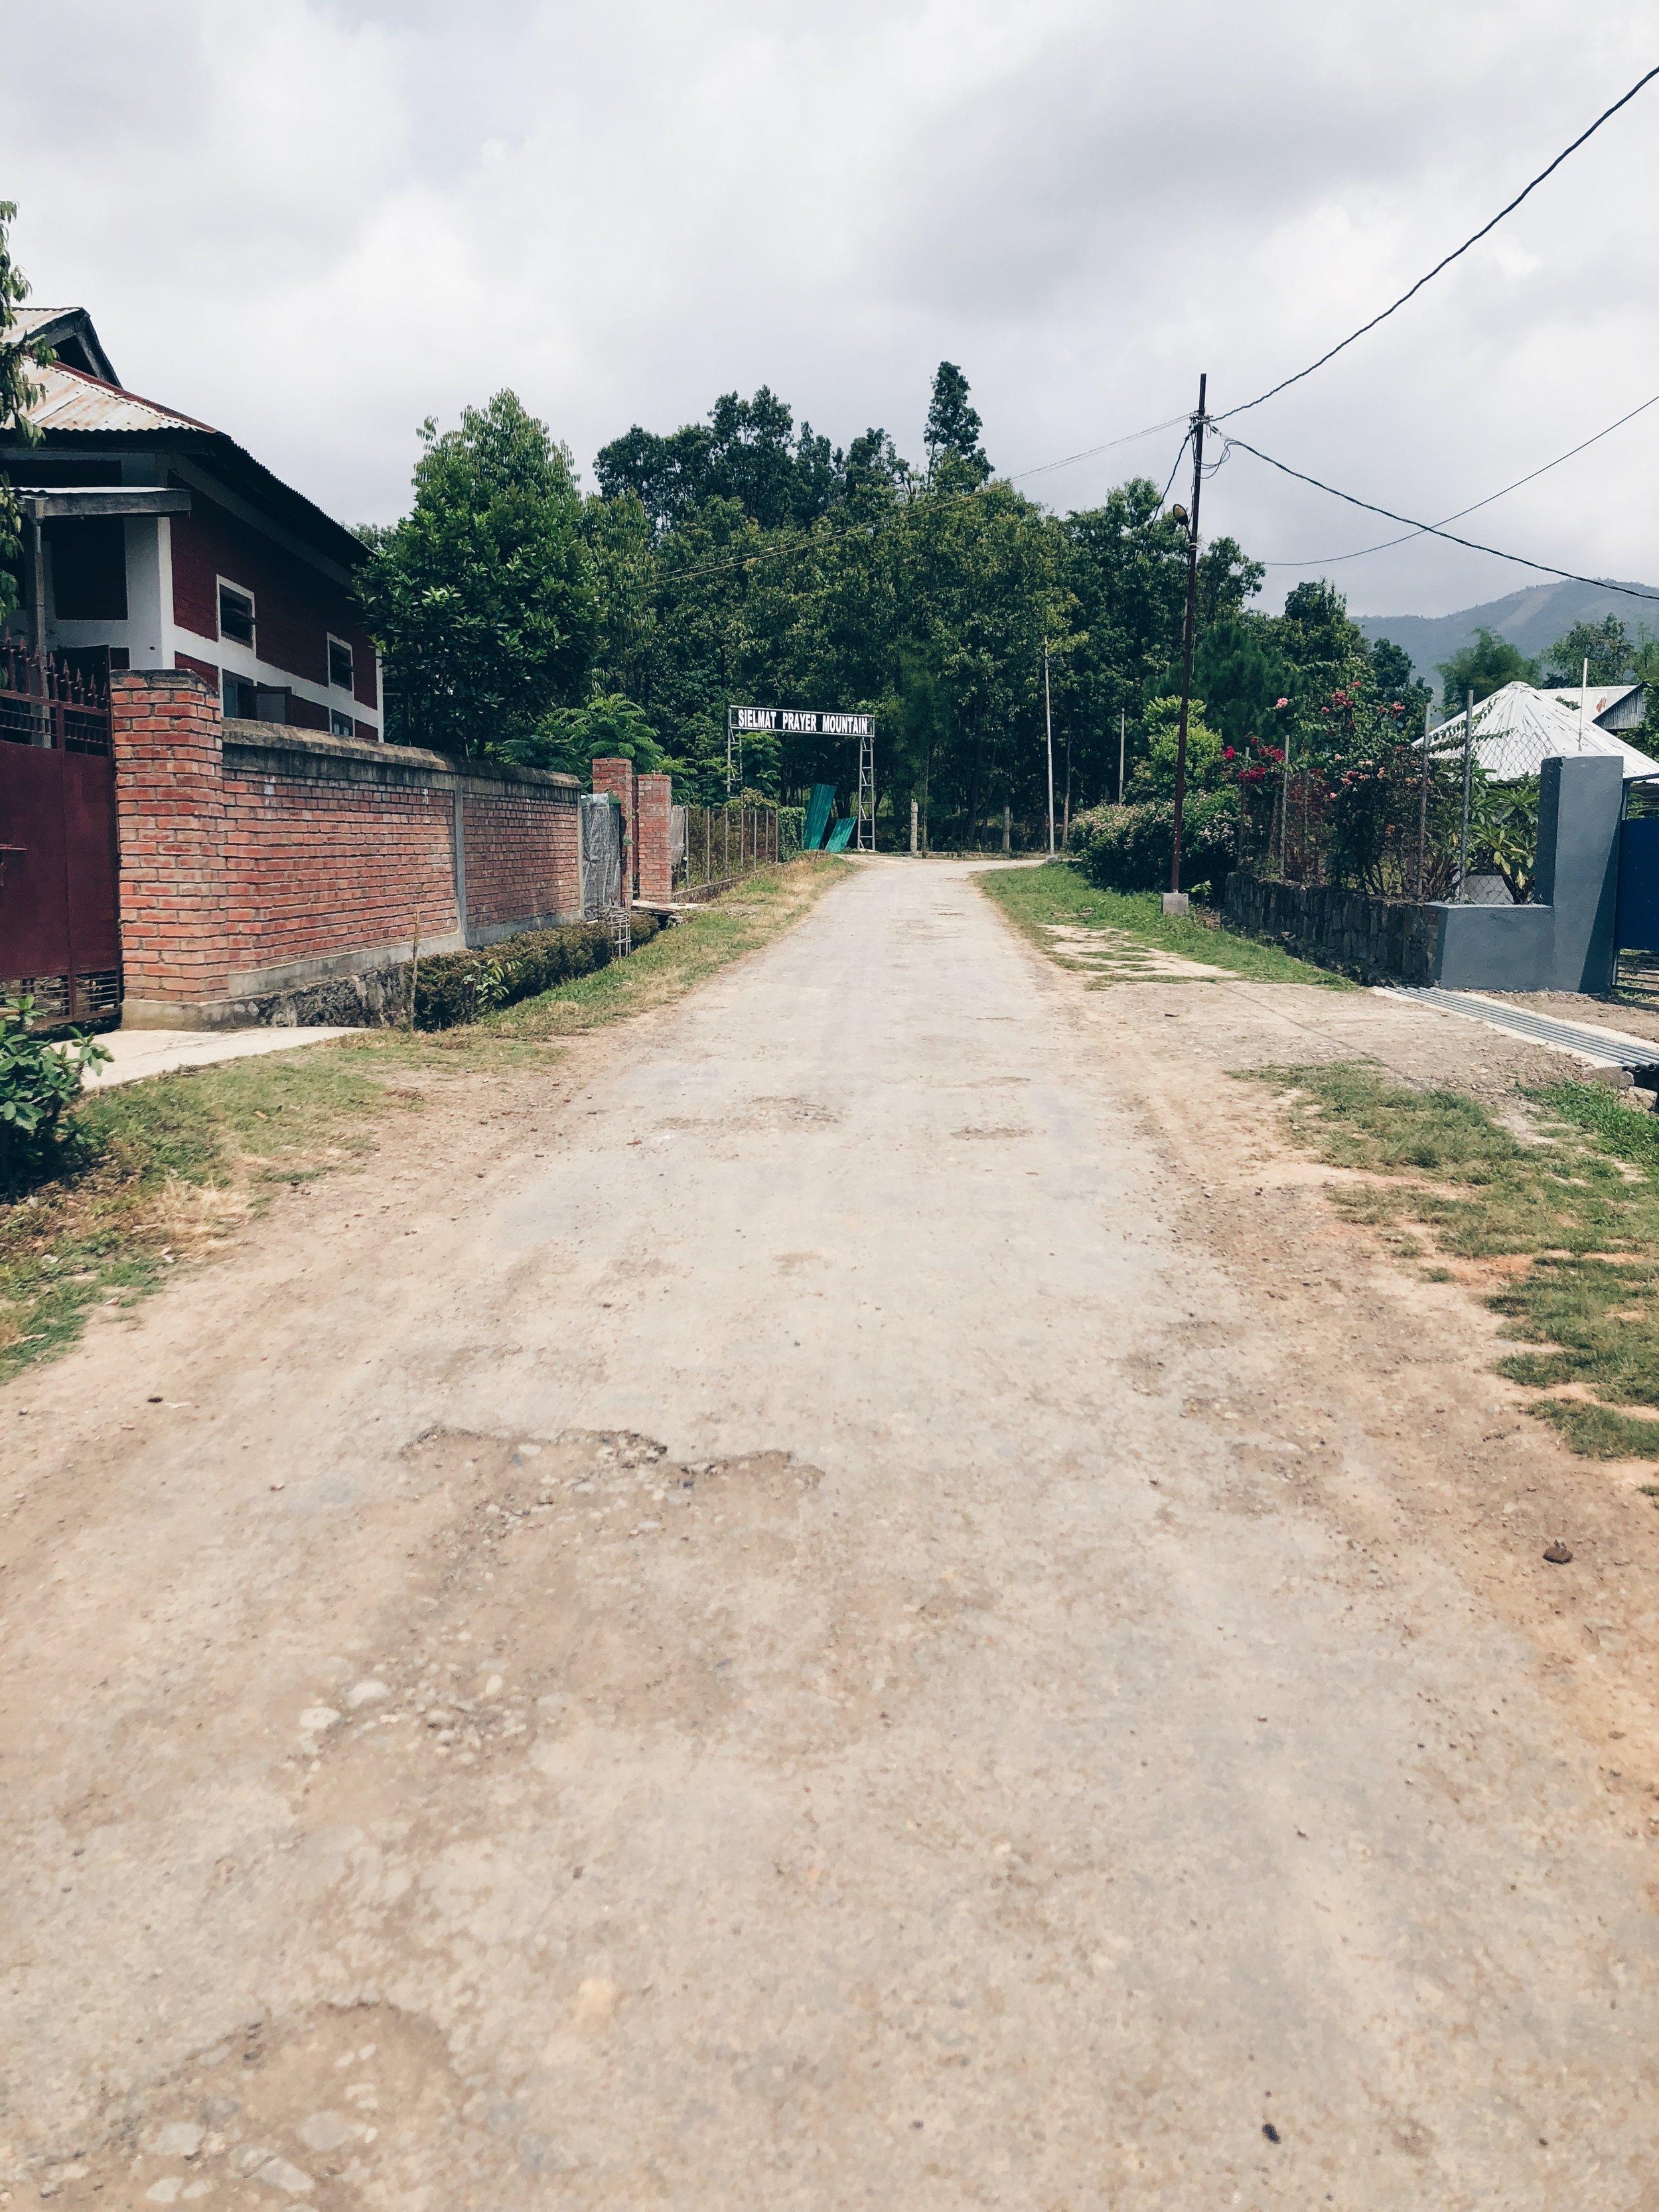 The main road through Sielmat that leads to Prayer Mountain